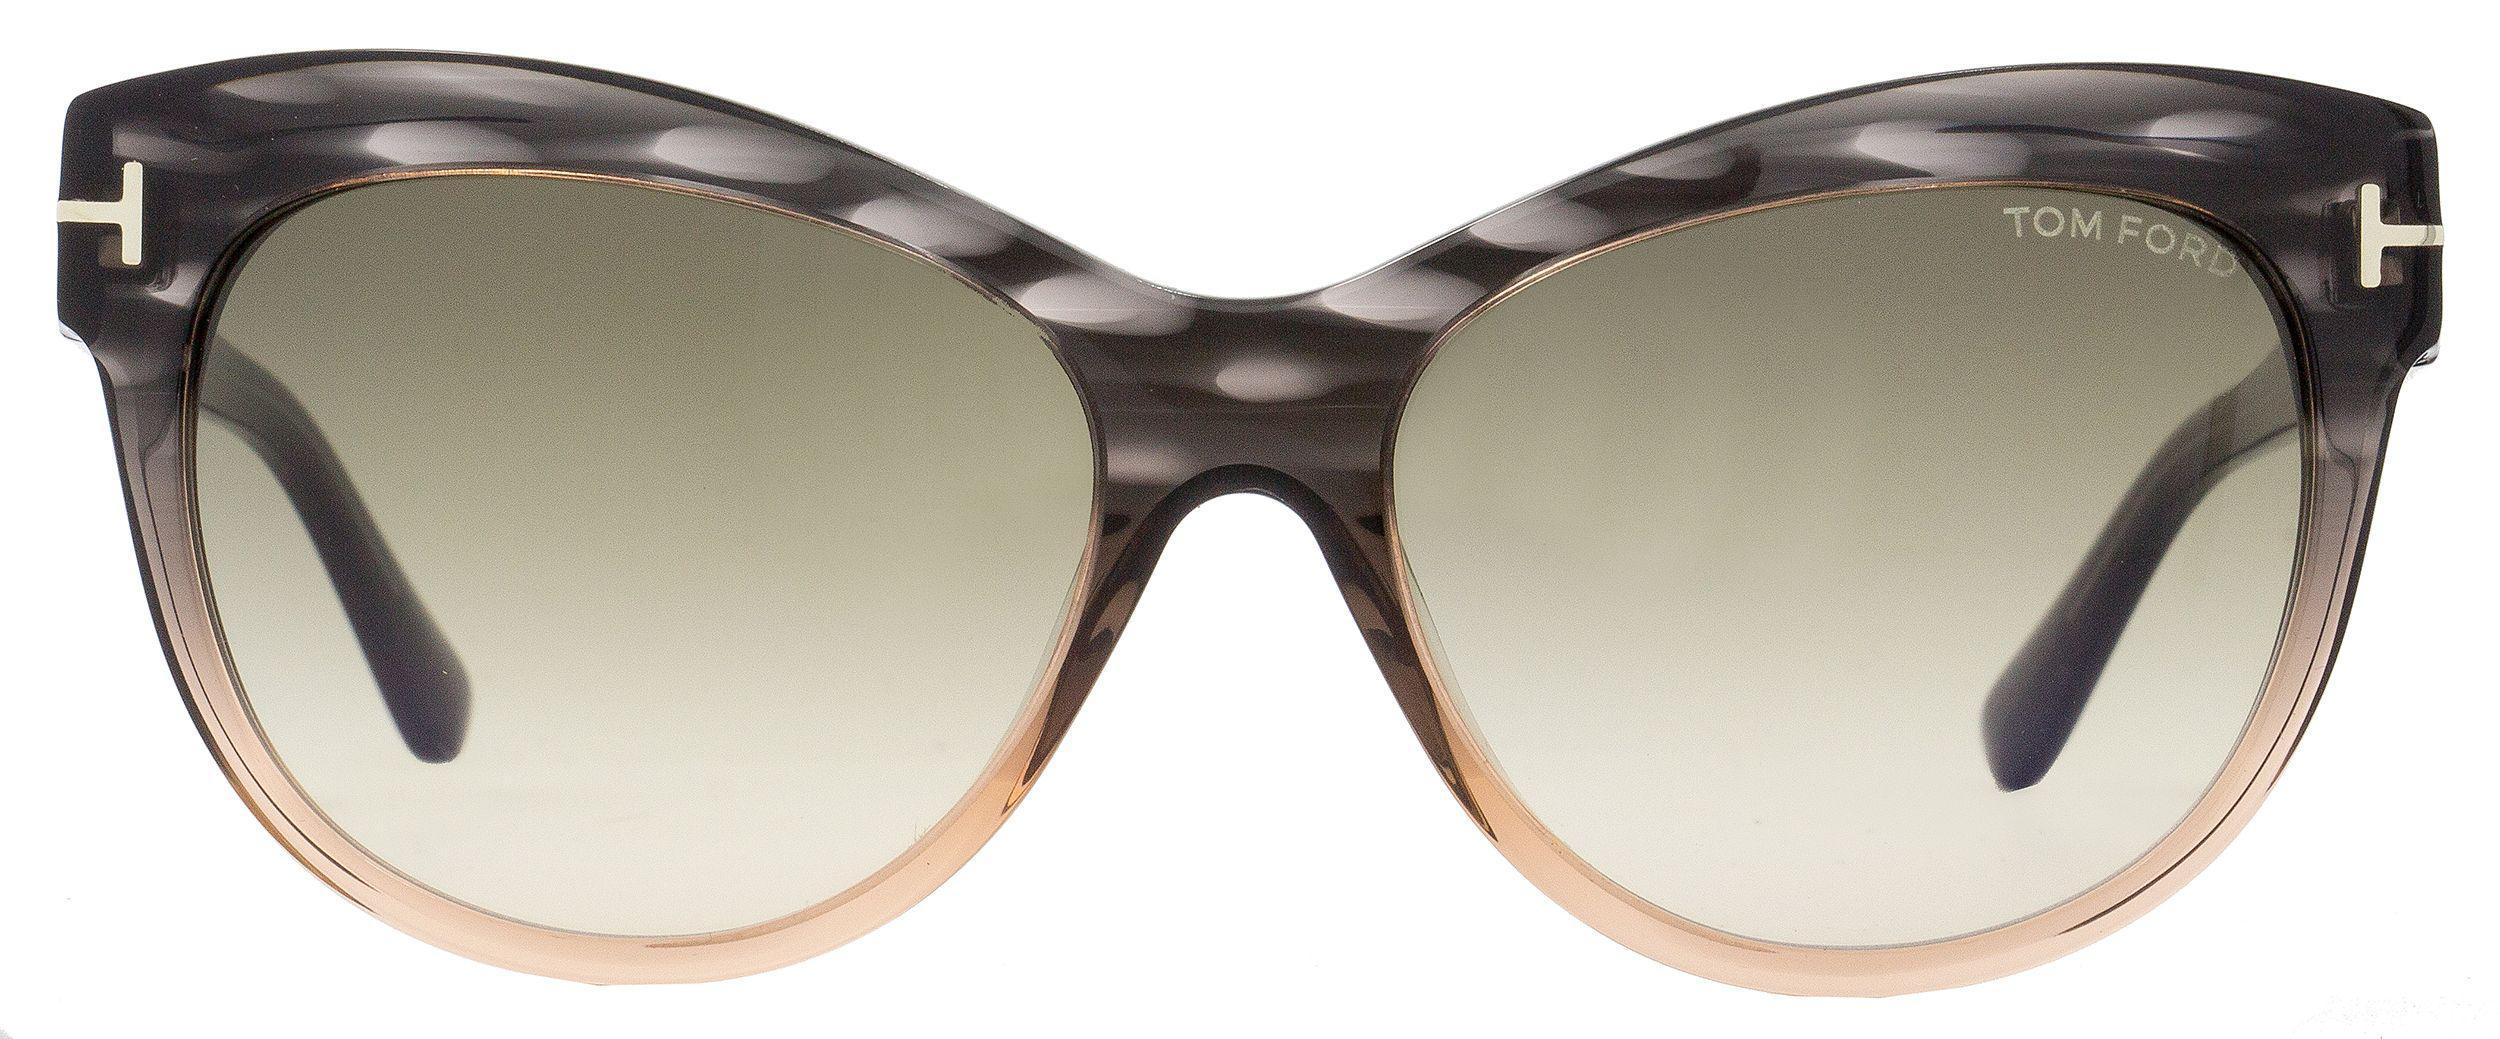 5cff7a3996ca2 Tom Ford - Cateye Sunglasses Tf430 Lily 20p Melange Gray peach Ft0430 -  Lyst. View fullscreen